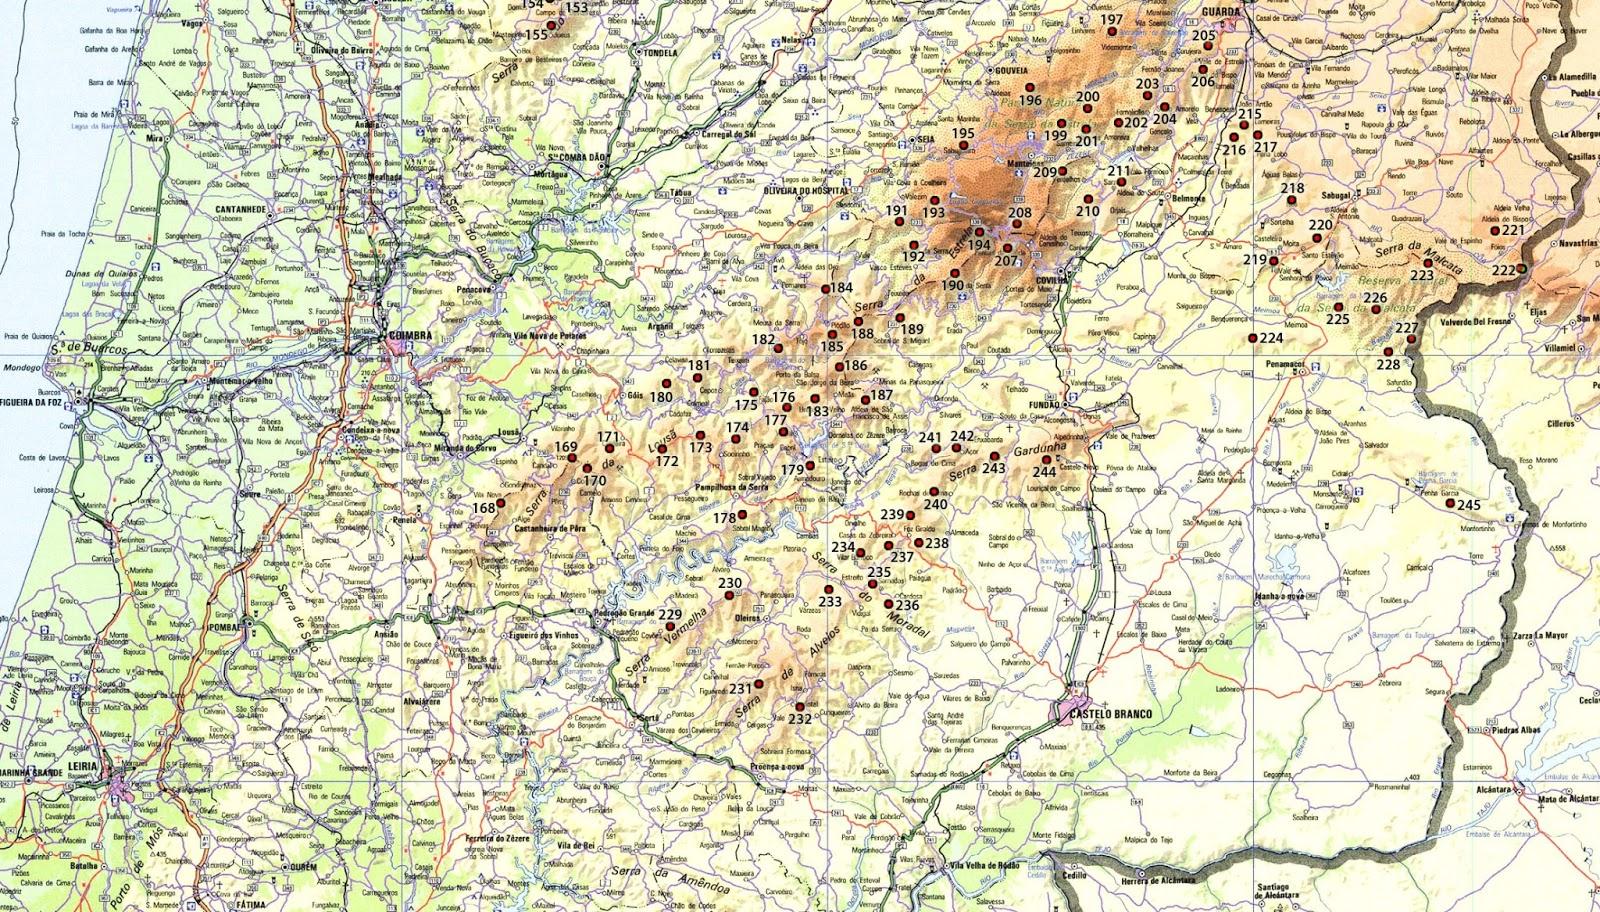 serra caramulo mapa Mapa De Portugal Serra Do Caramulo | thujamassages serra caramulo mapa